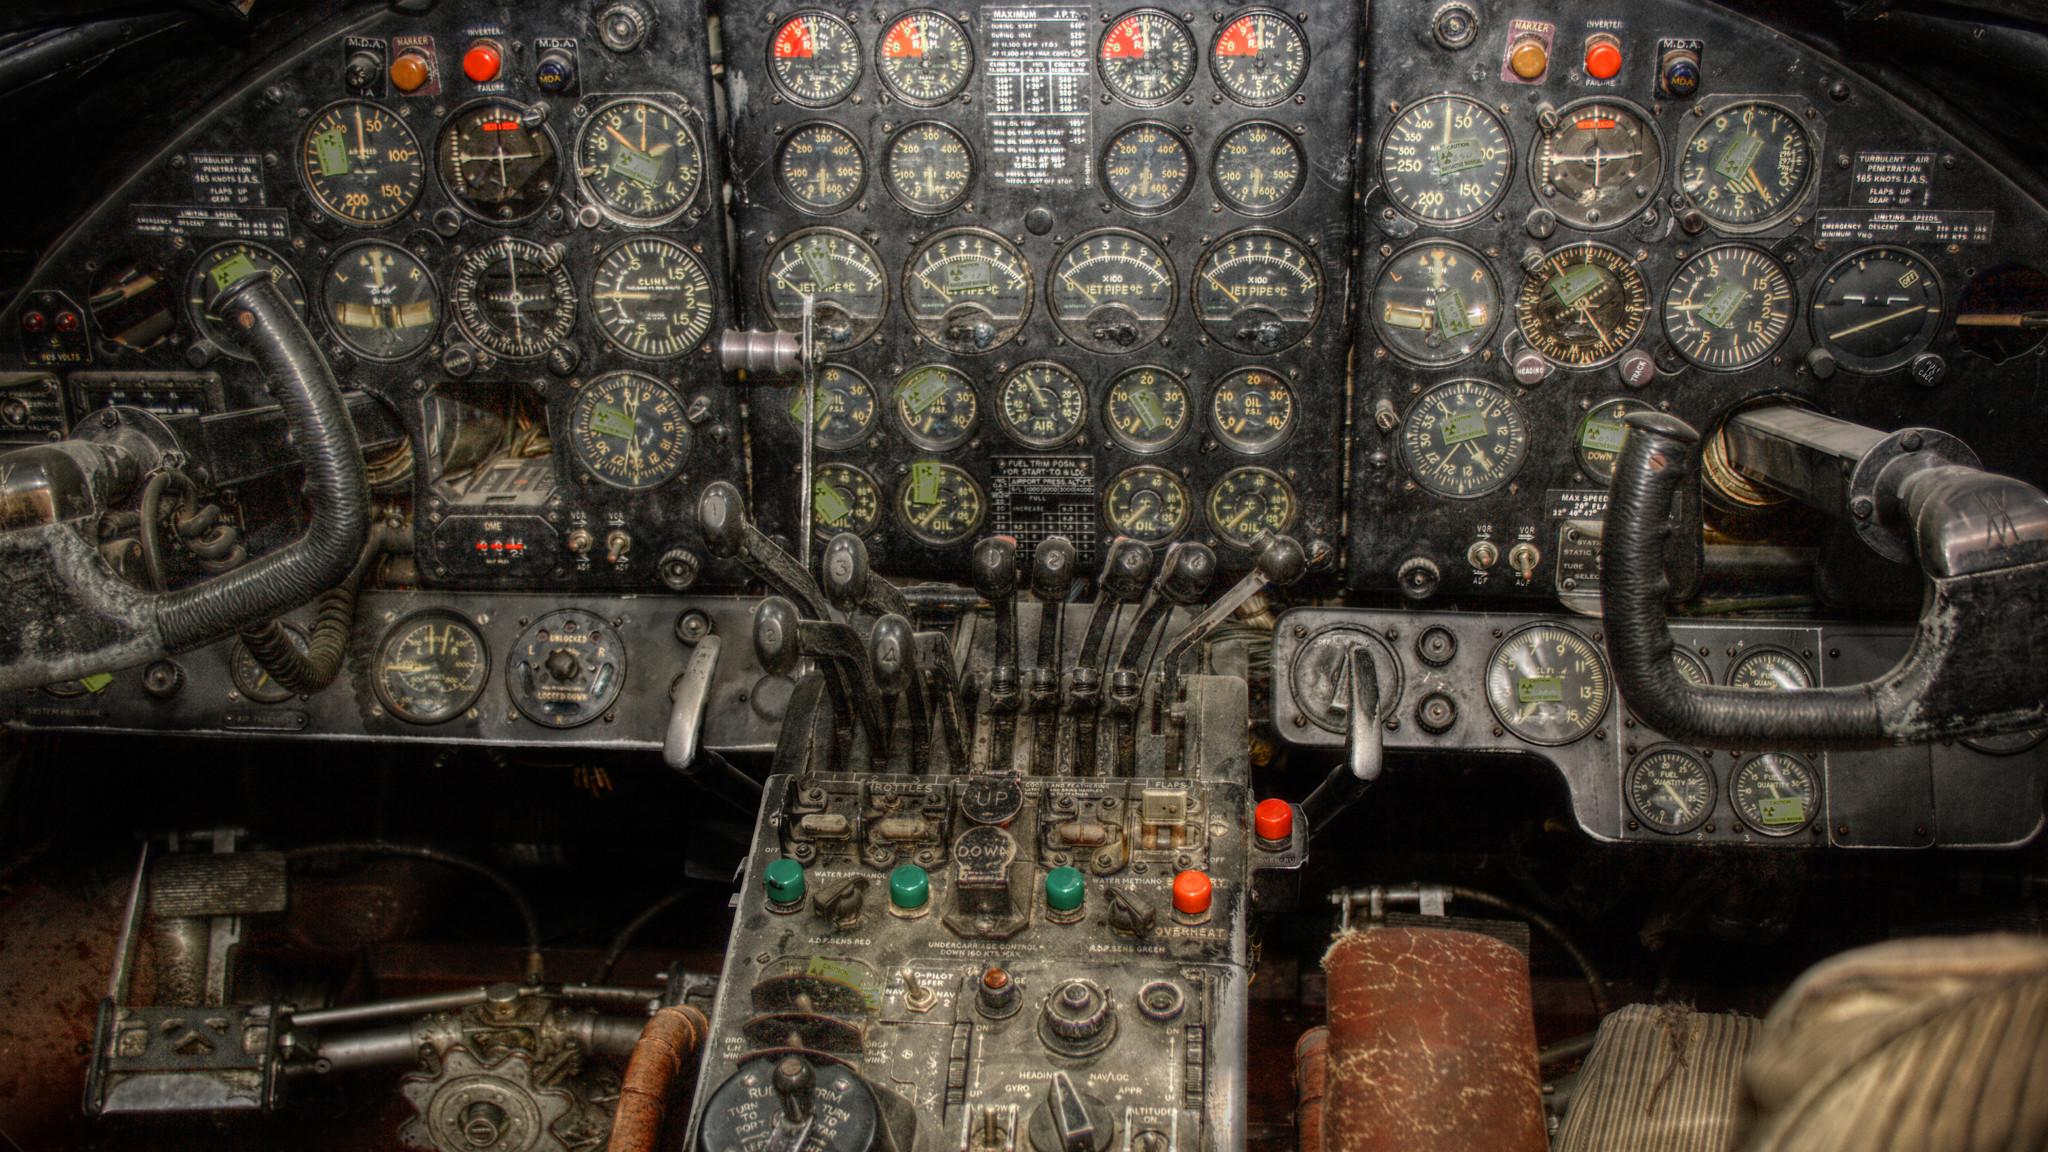 Vintage Airplane Cockpit Wallpaper Vergil Kanne Photography